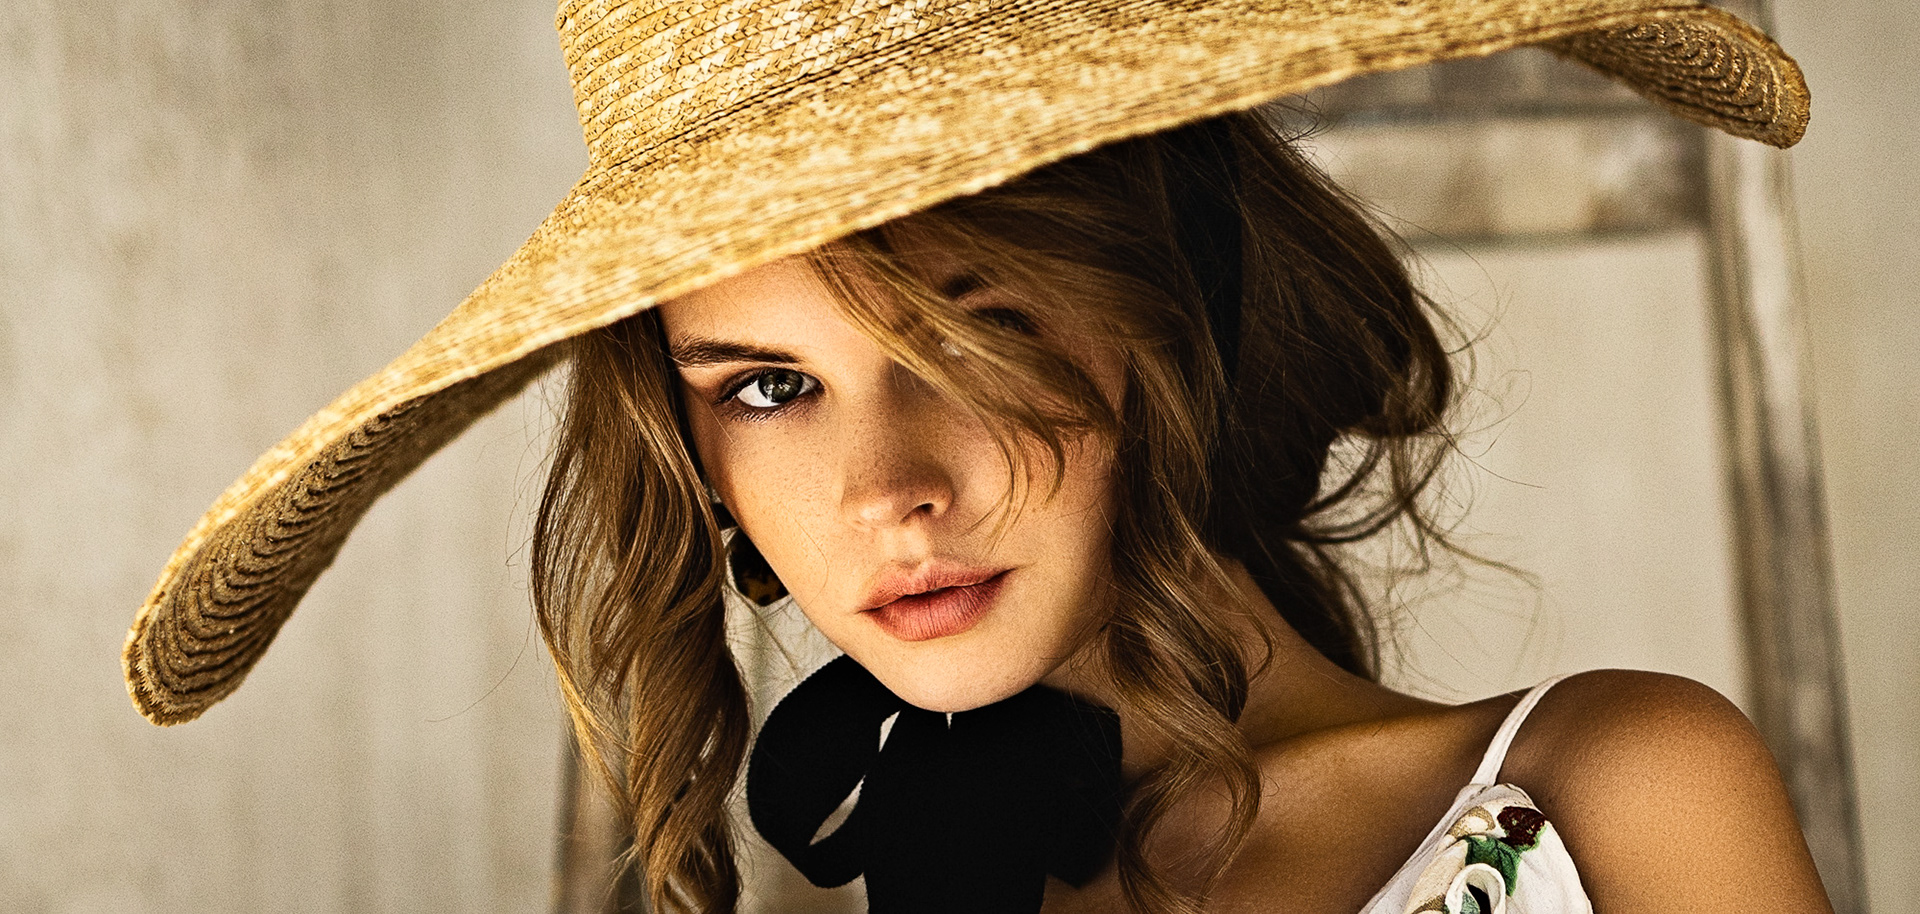 Le Chapeau / модель Анастасия Щеглова фото Jona Temper